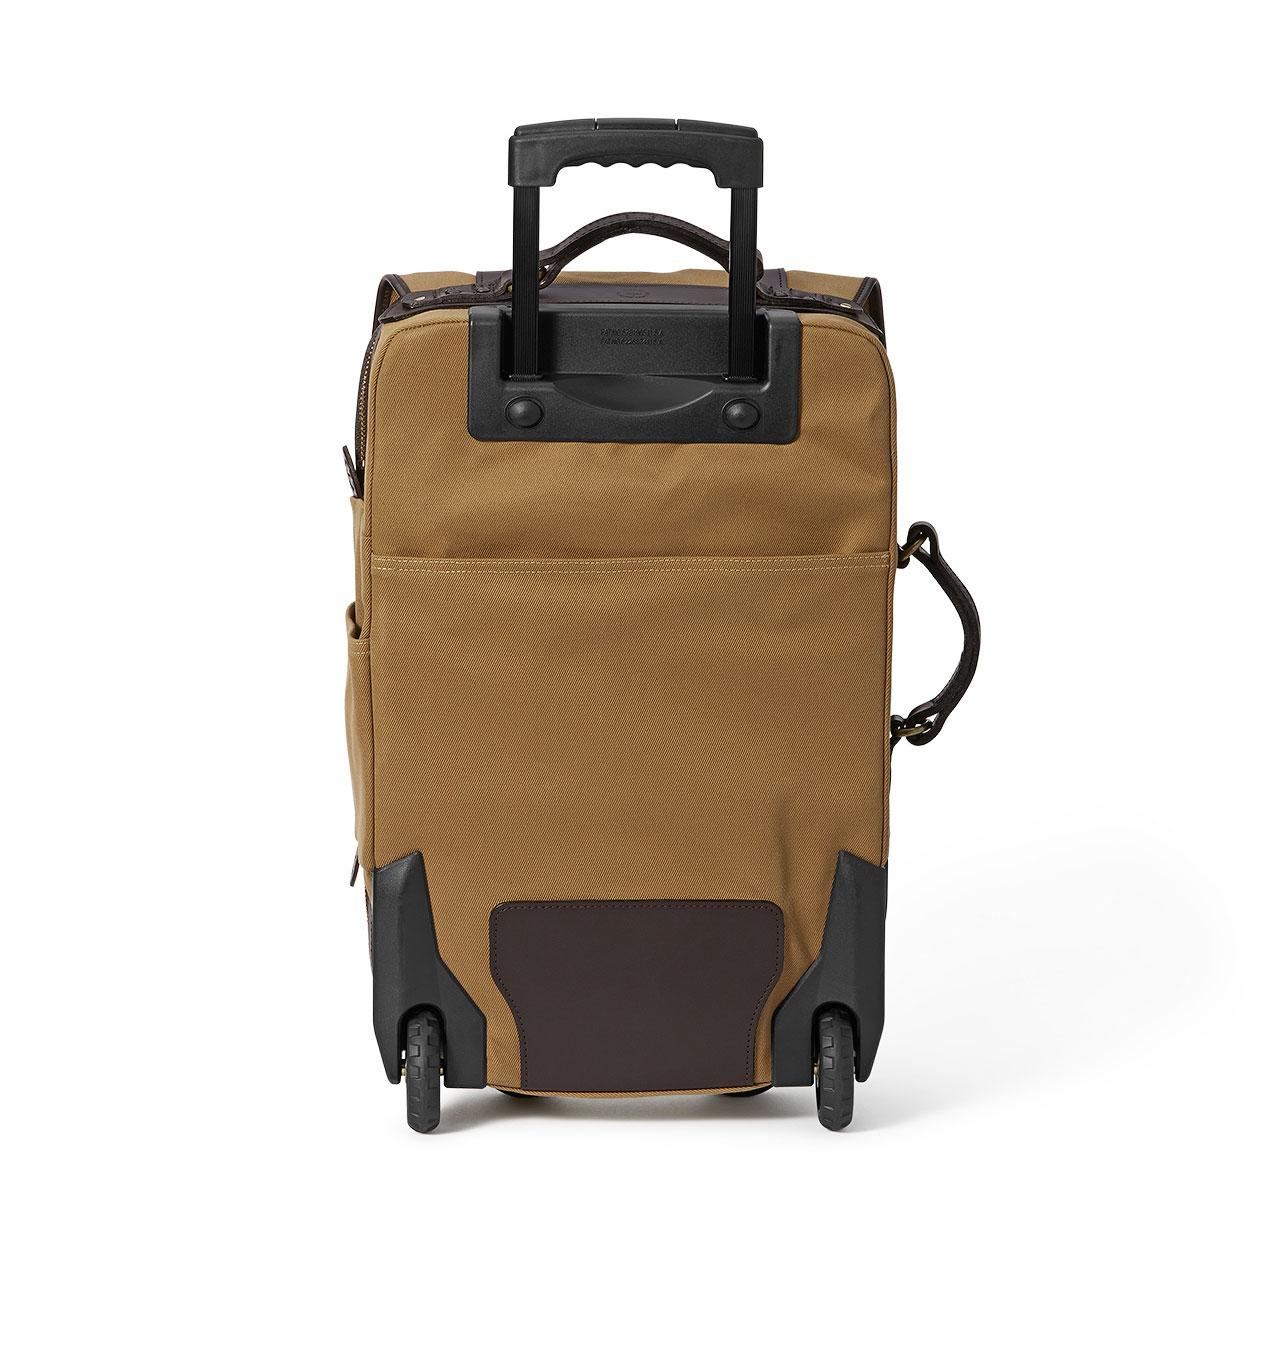 cad72f2c344 Filson - Rugged Twill Rolling Carry-on Bag Medium - Tan